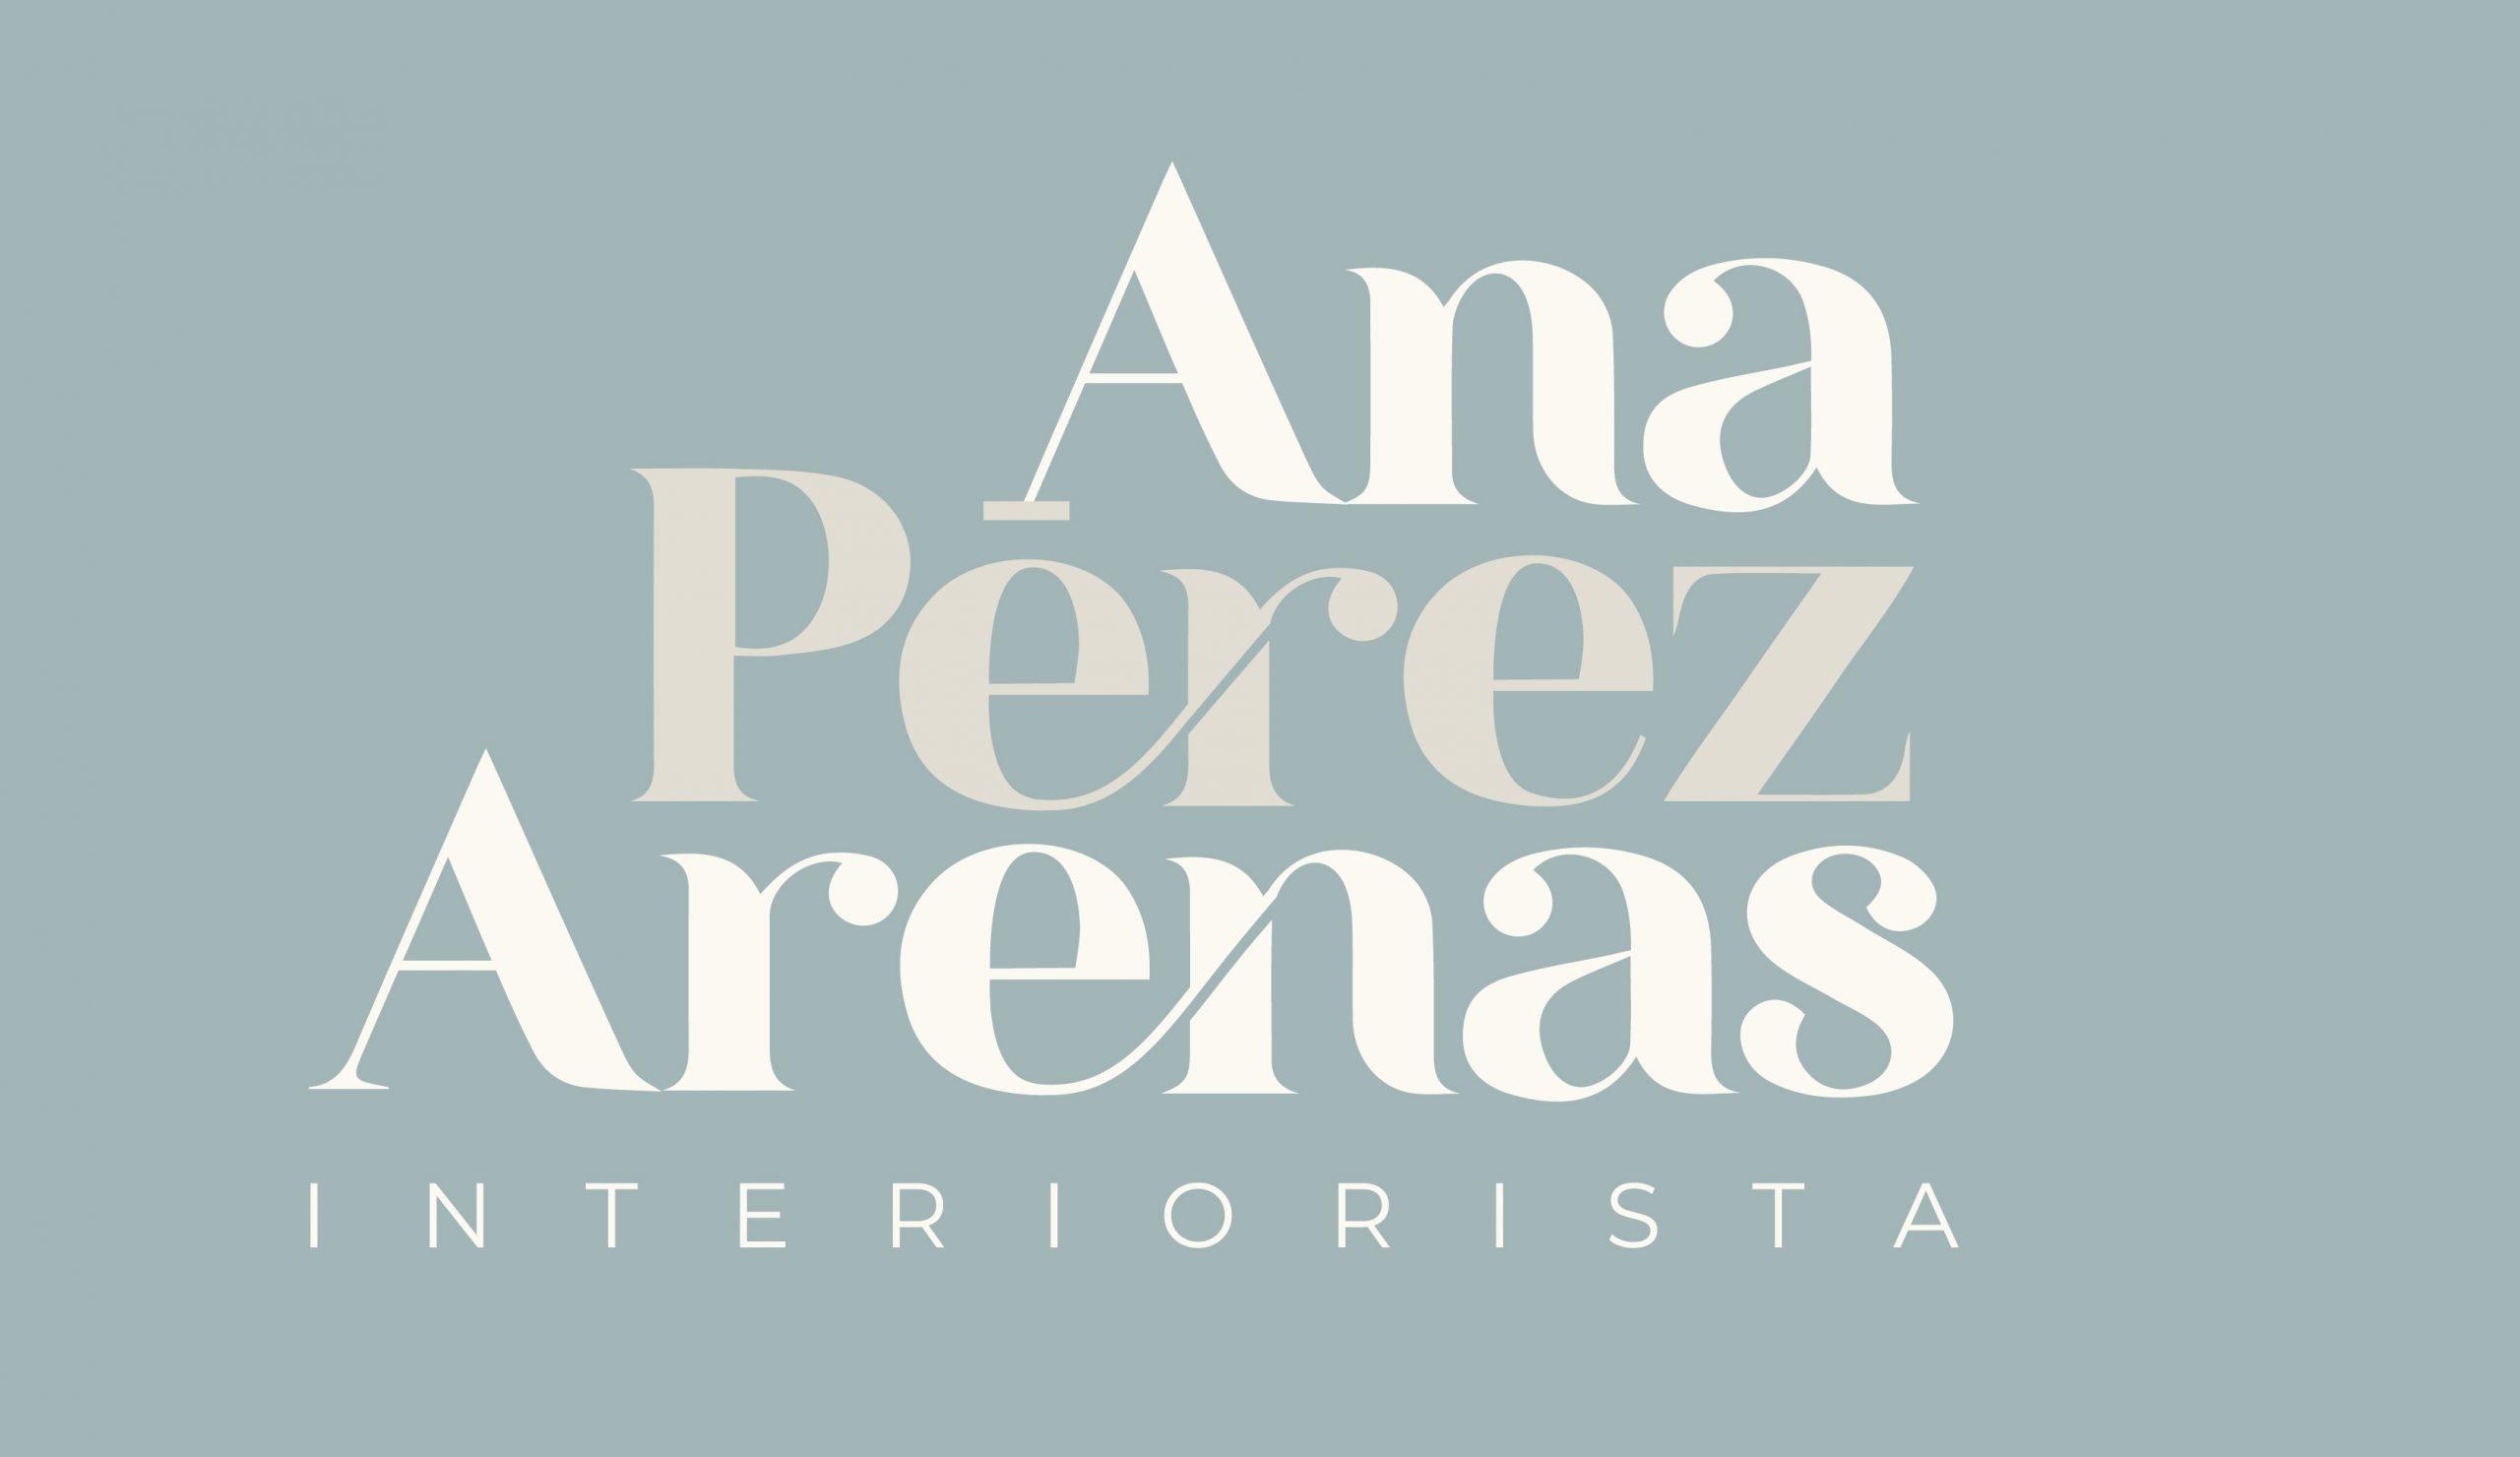 Ana Perez Arenas Interiorista